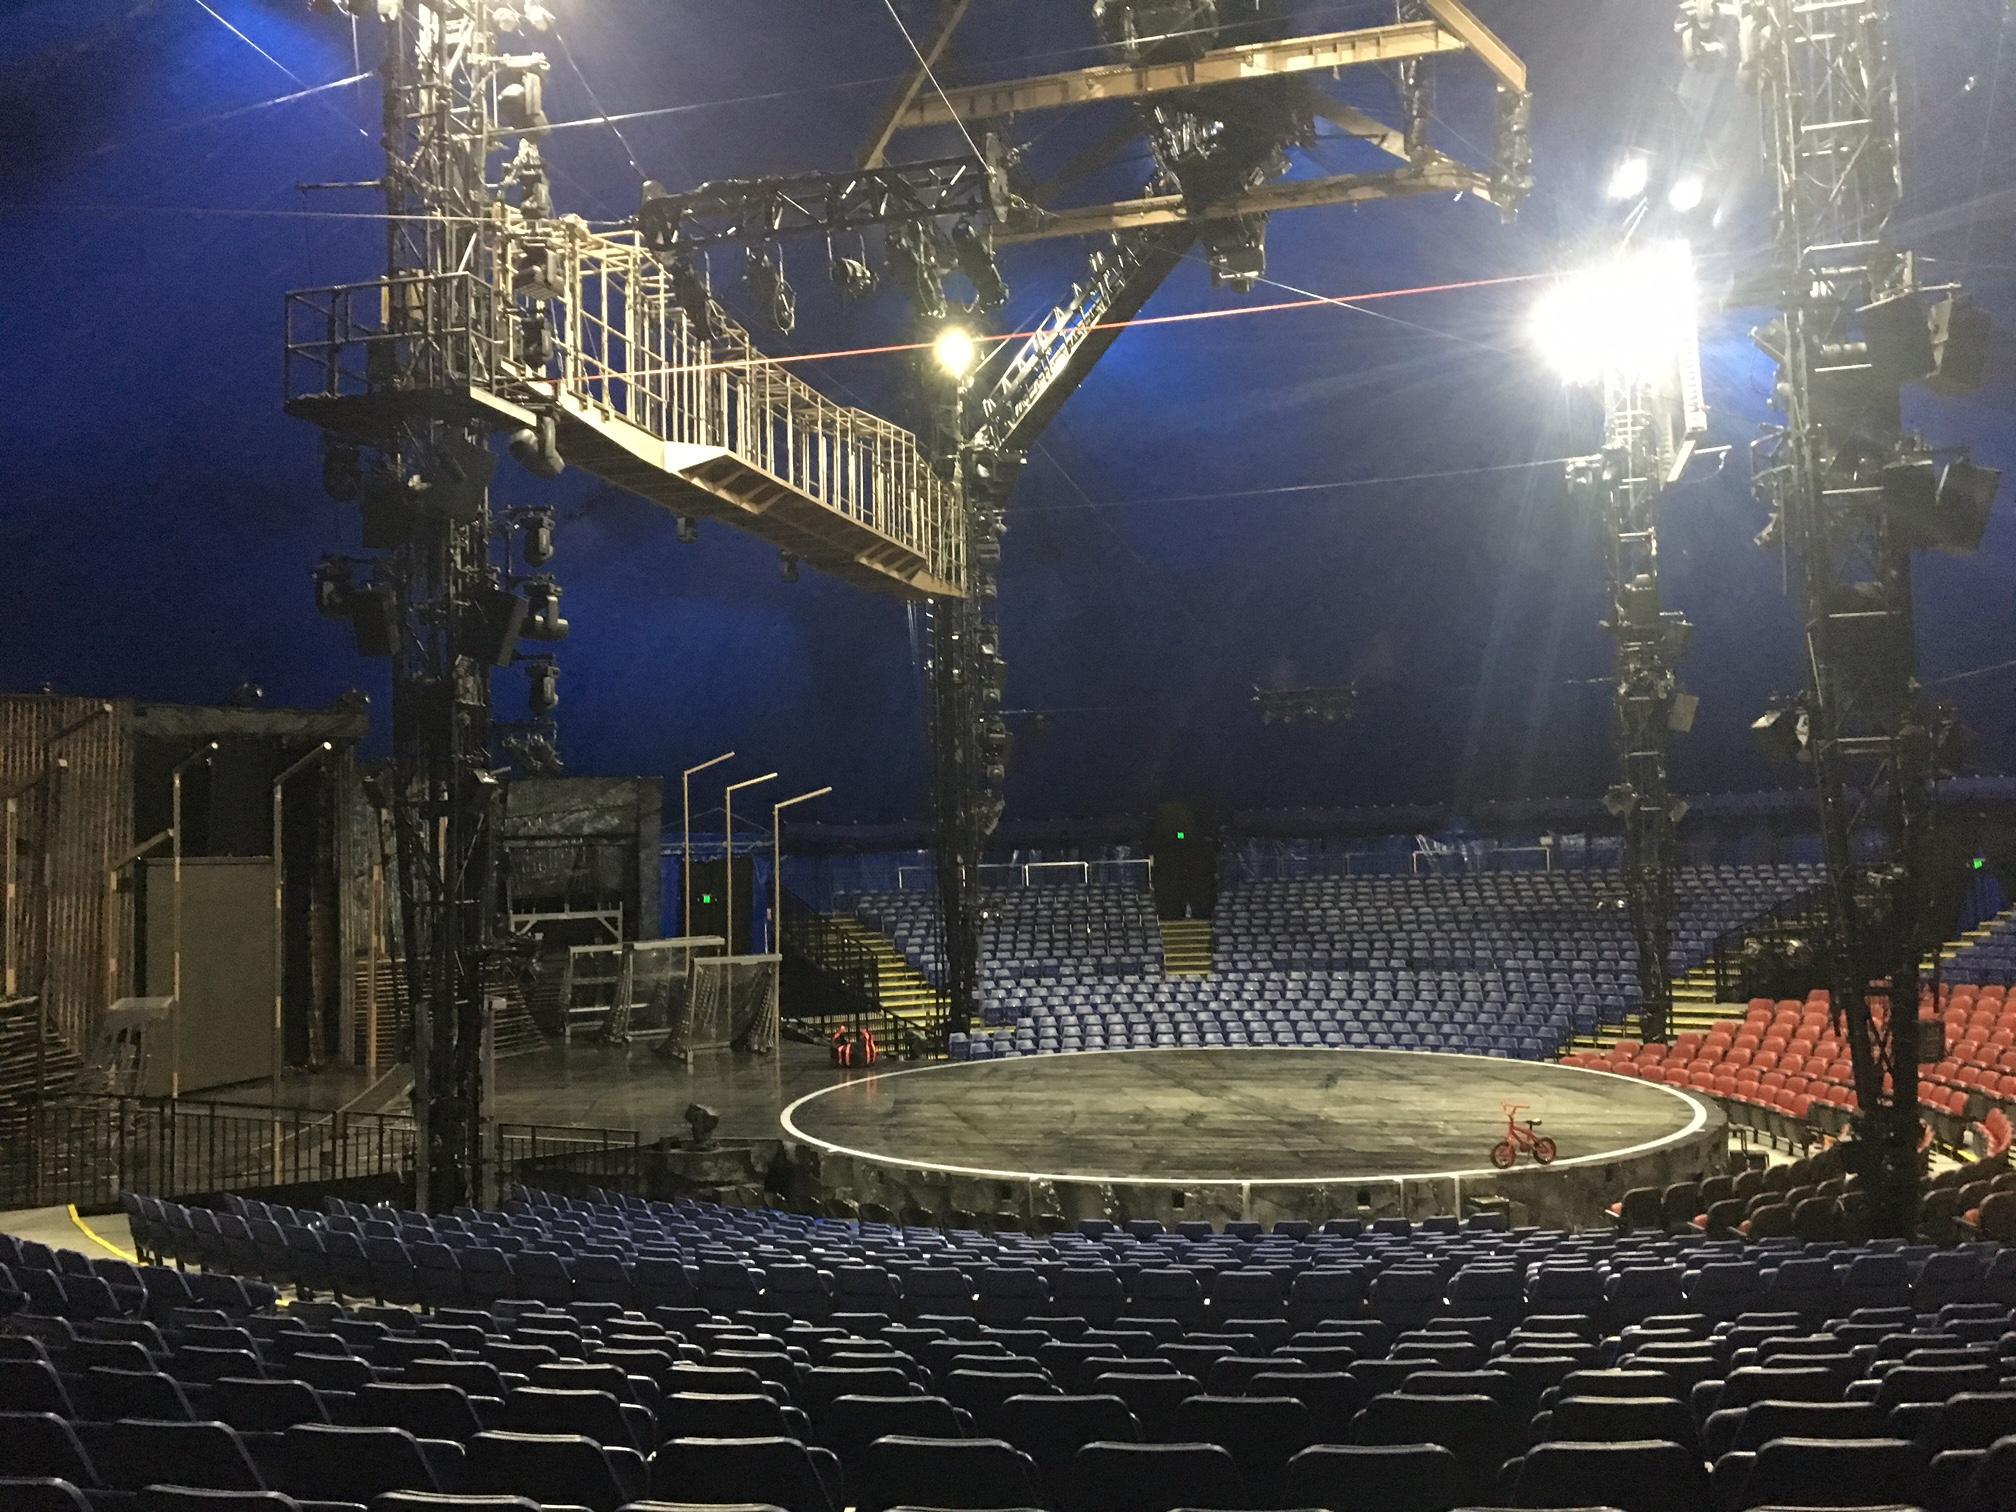 Cirque Du Soleil - Volta Section 203 Row Q